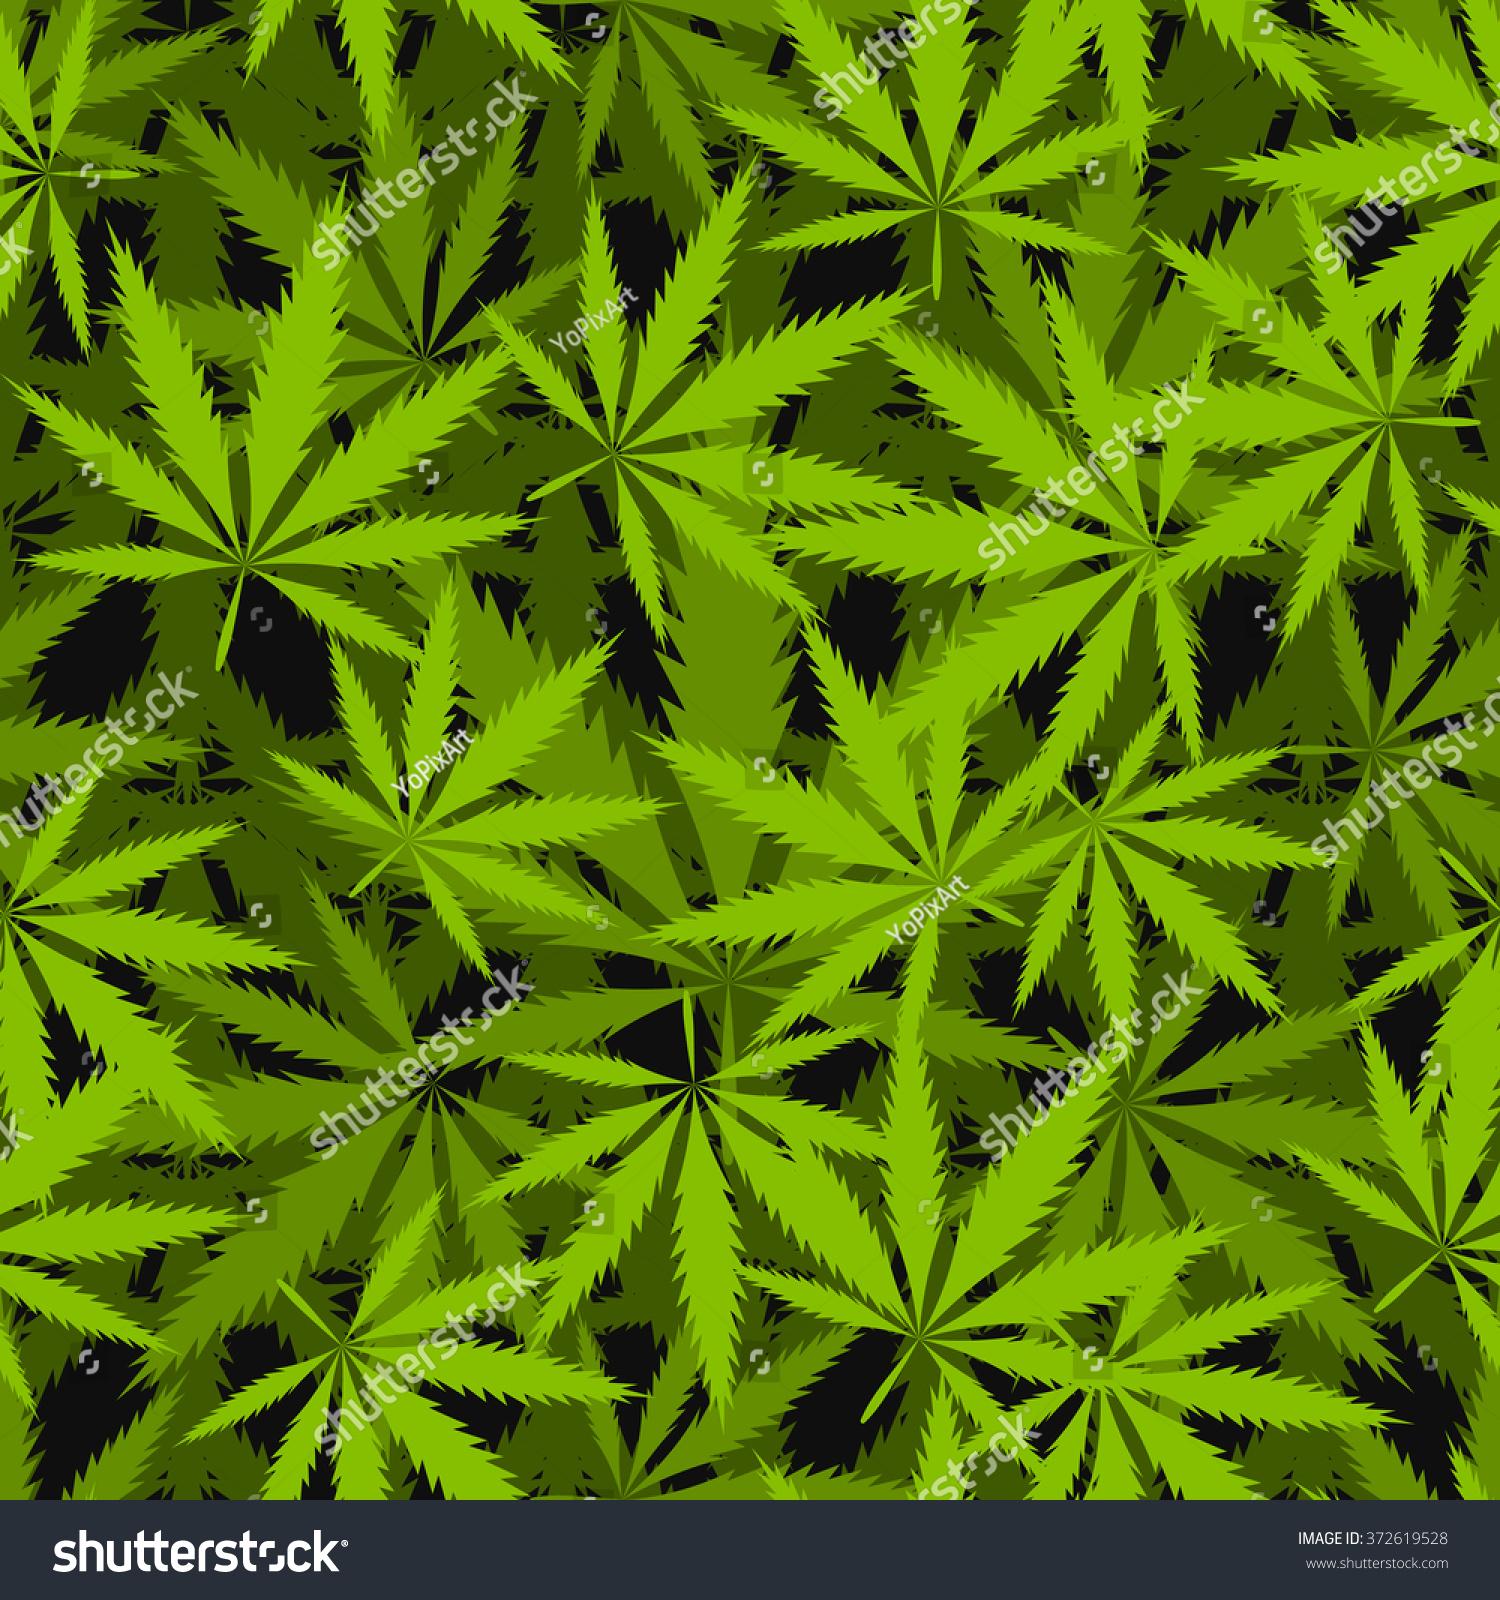 Marijuana Leaves Seamless Vector Pattern Cannabis Stock Vector ...